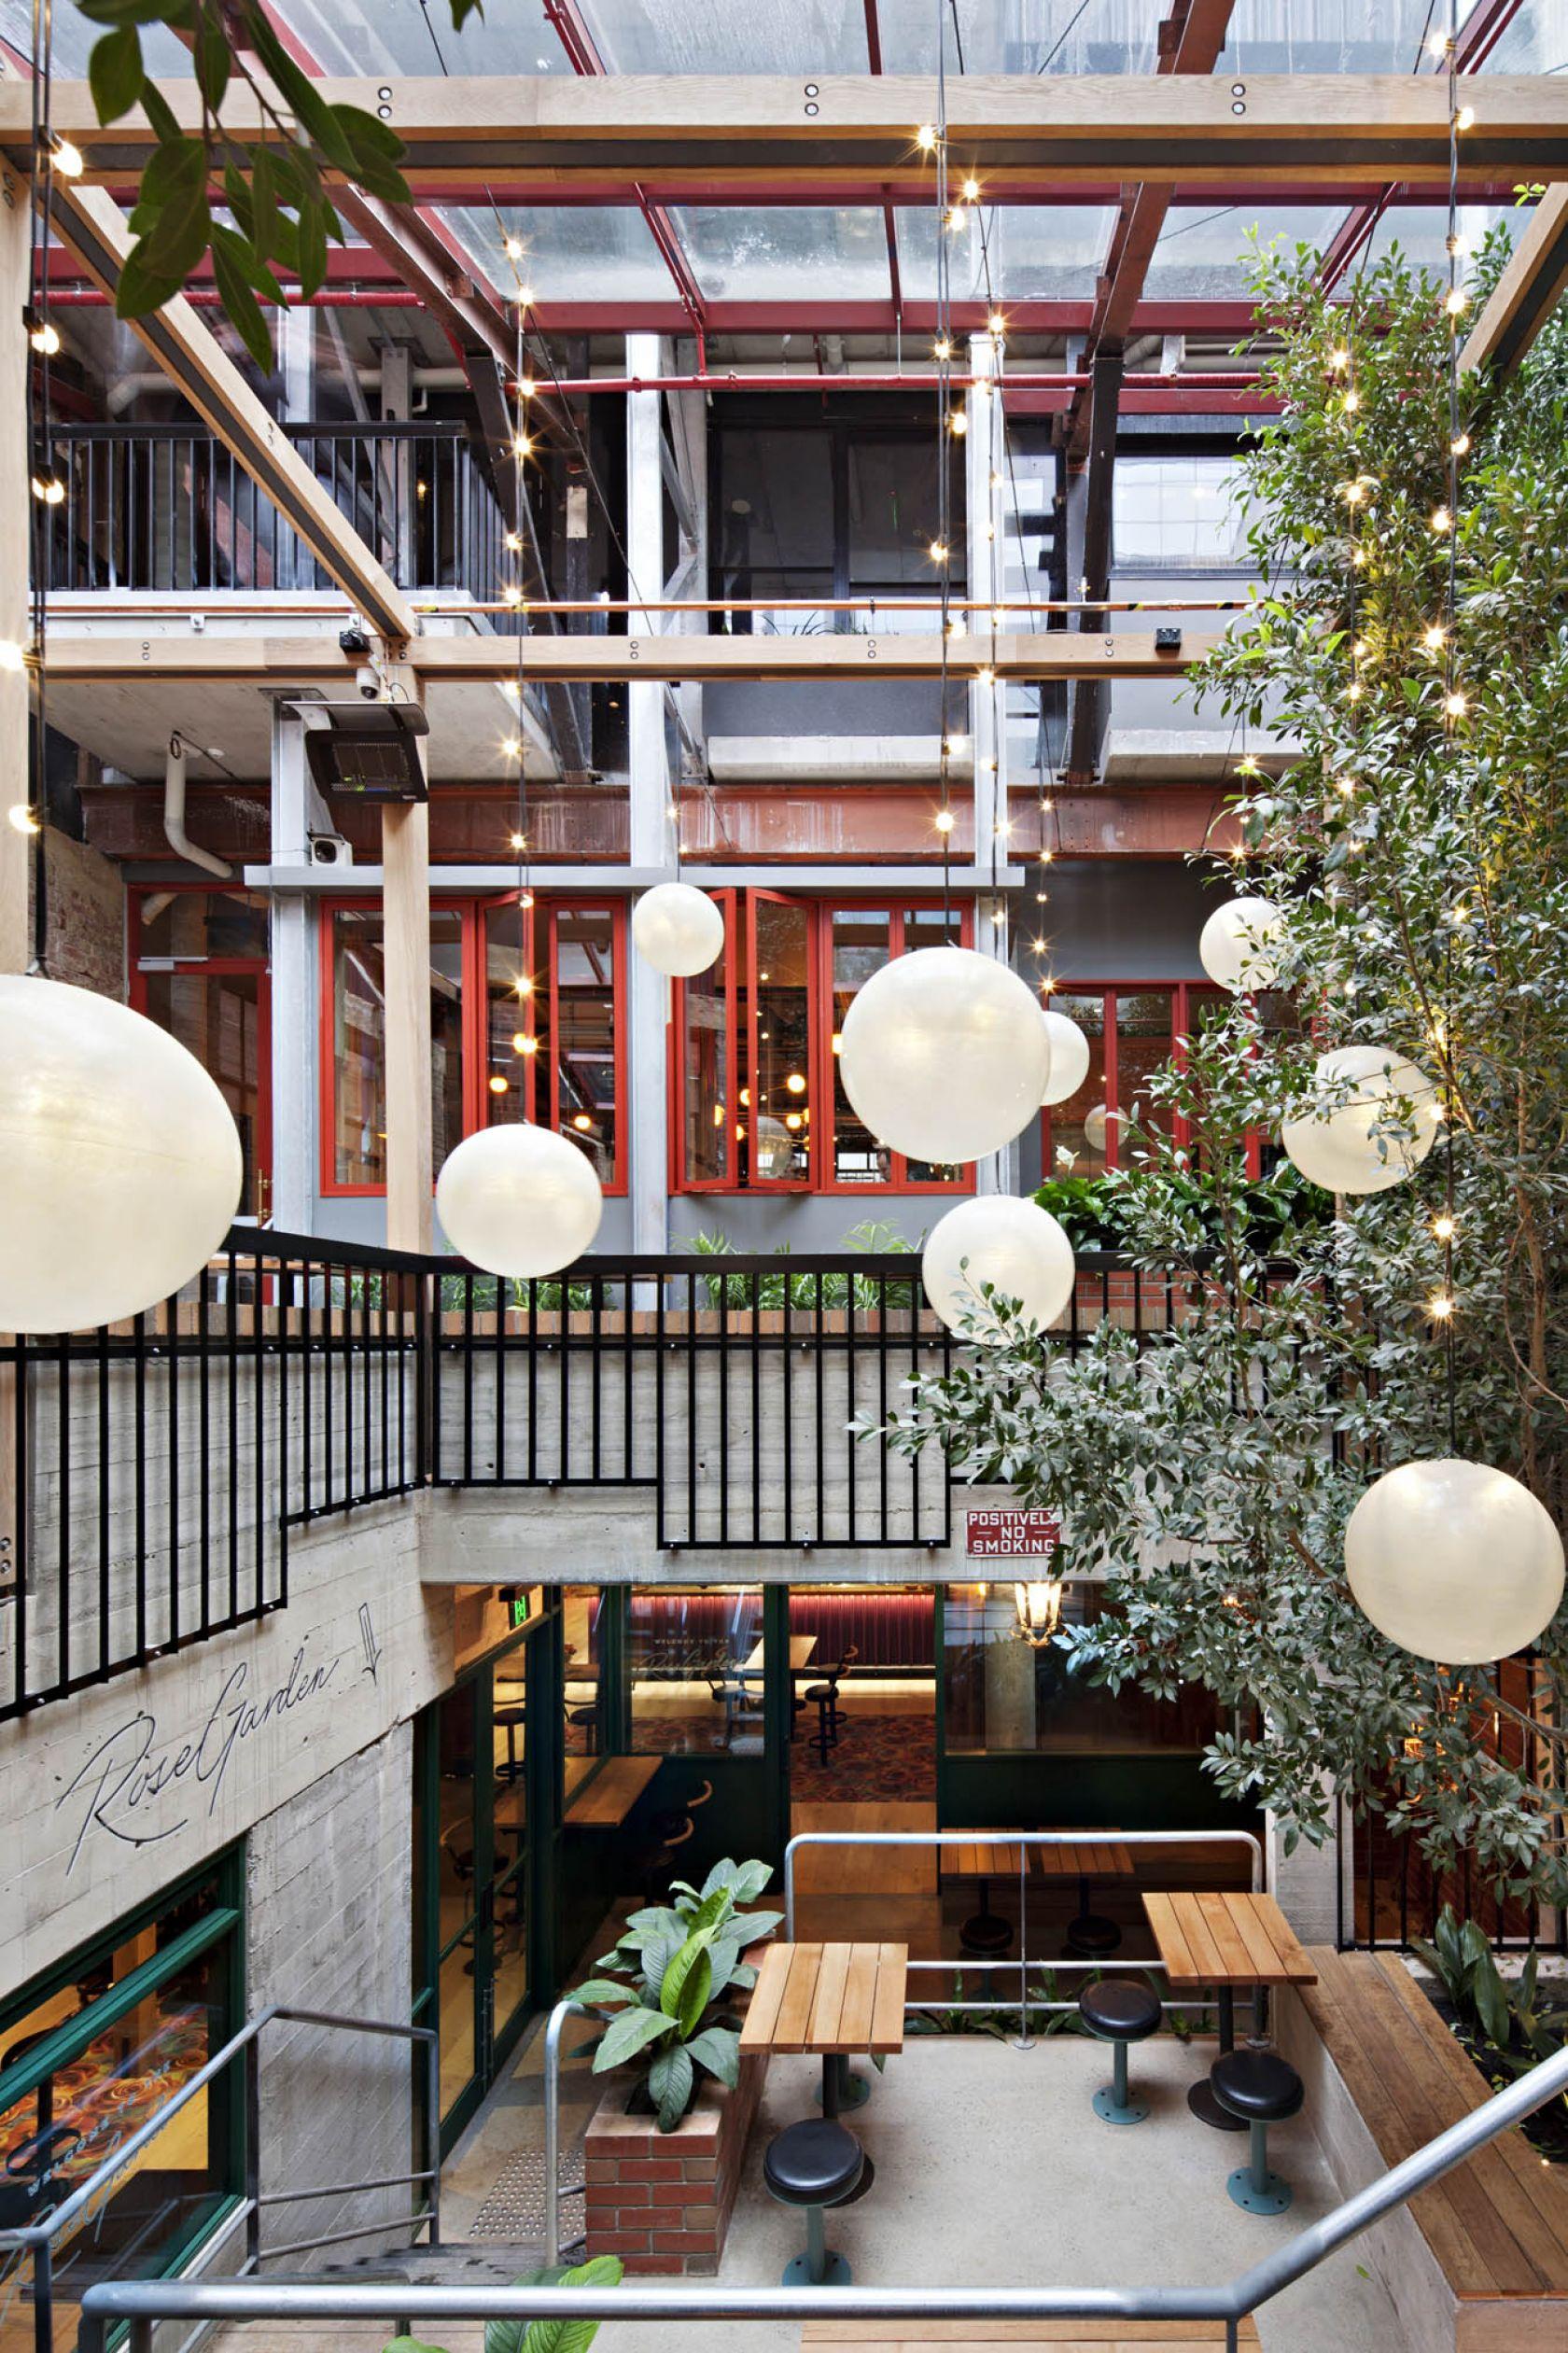 garden state hotel melbourne fitout outdoor alfresco trees pendant lighting balustrades mezzanine